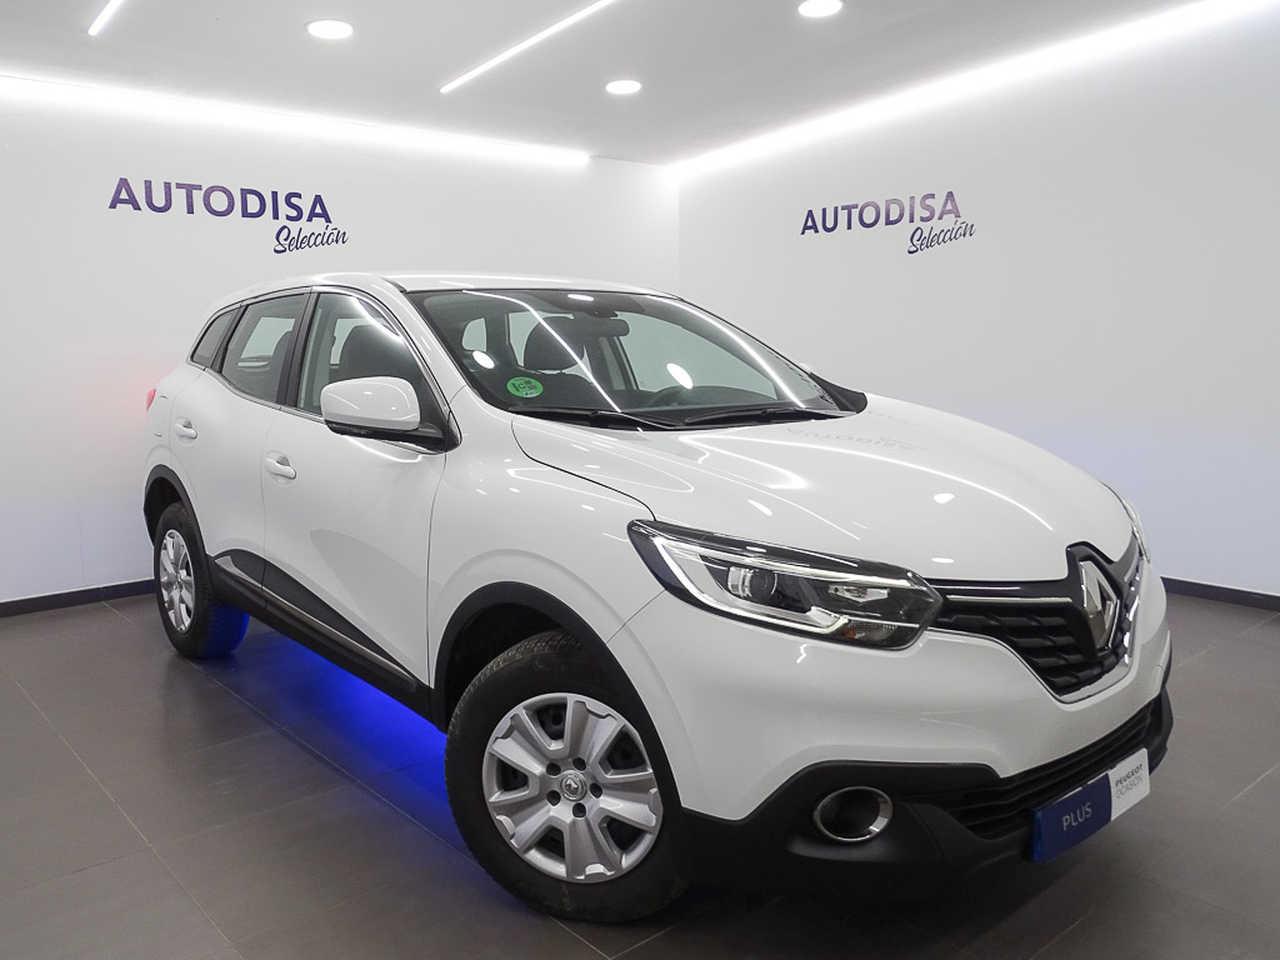 Renault Kadjar 1.6 DCI business